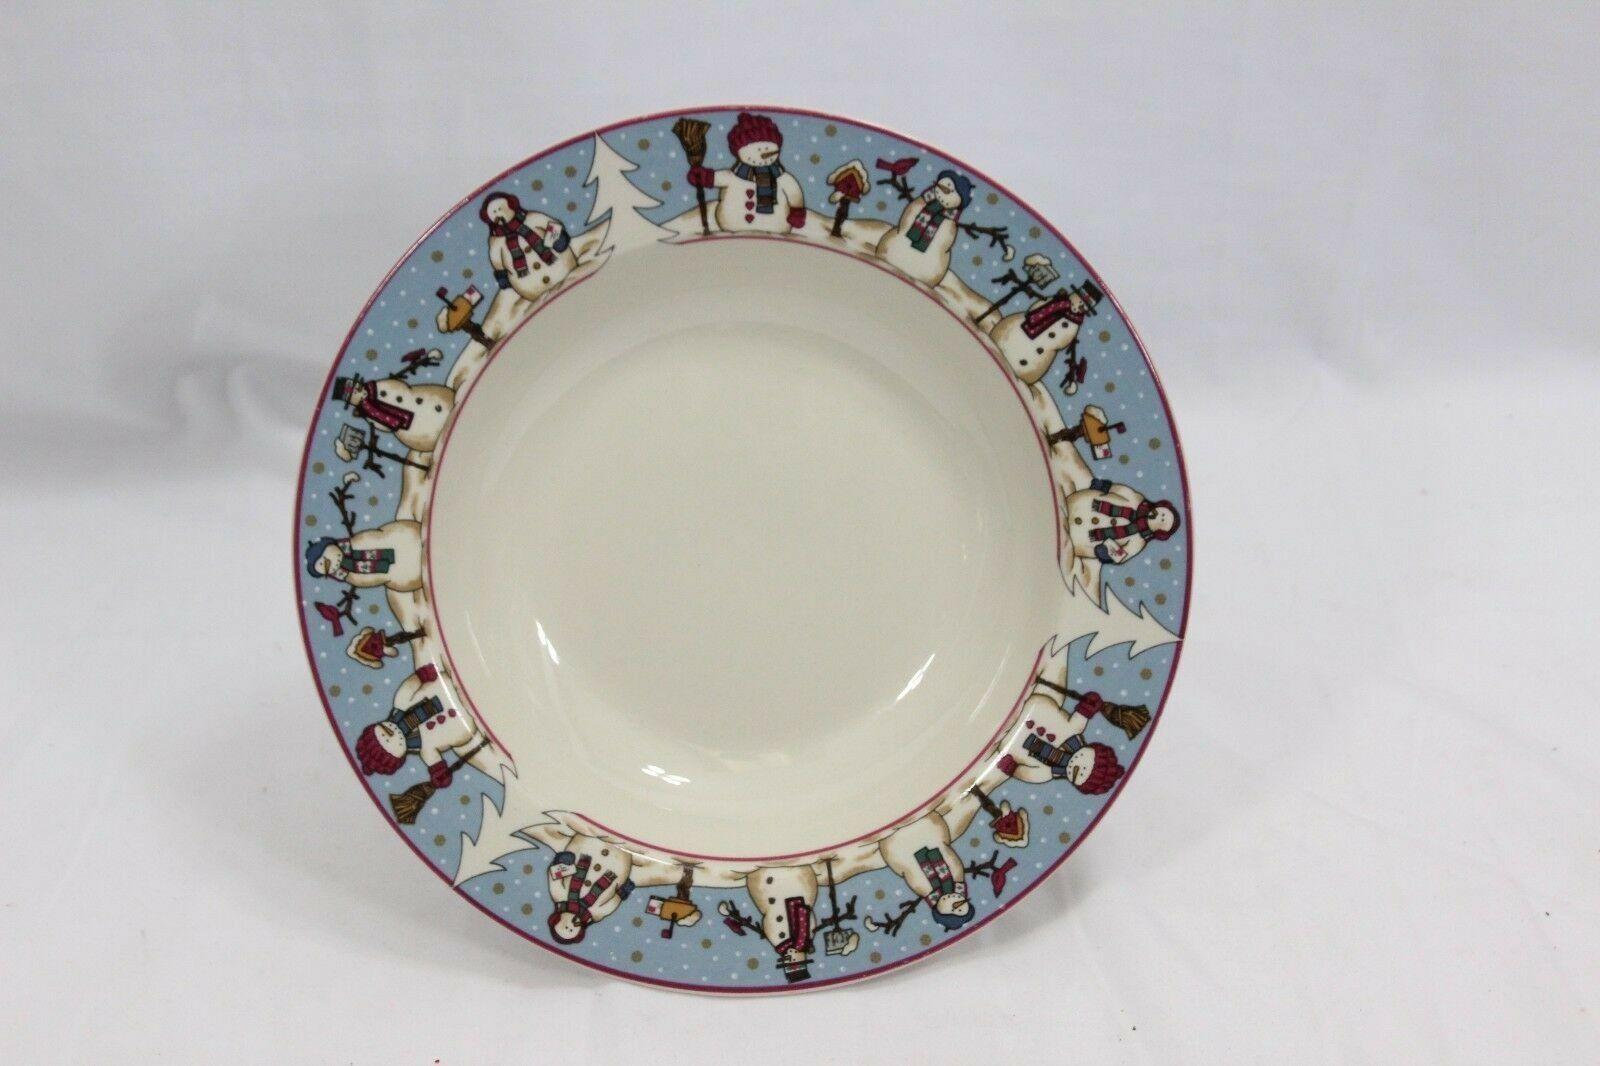 "Snowmen Serenade Rim Soup Bowls Cambridge 8.5"" Set of 12"